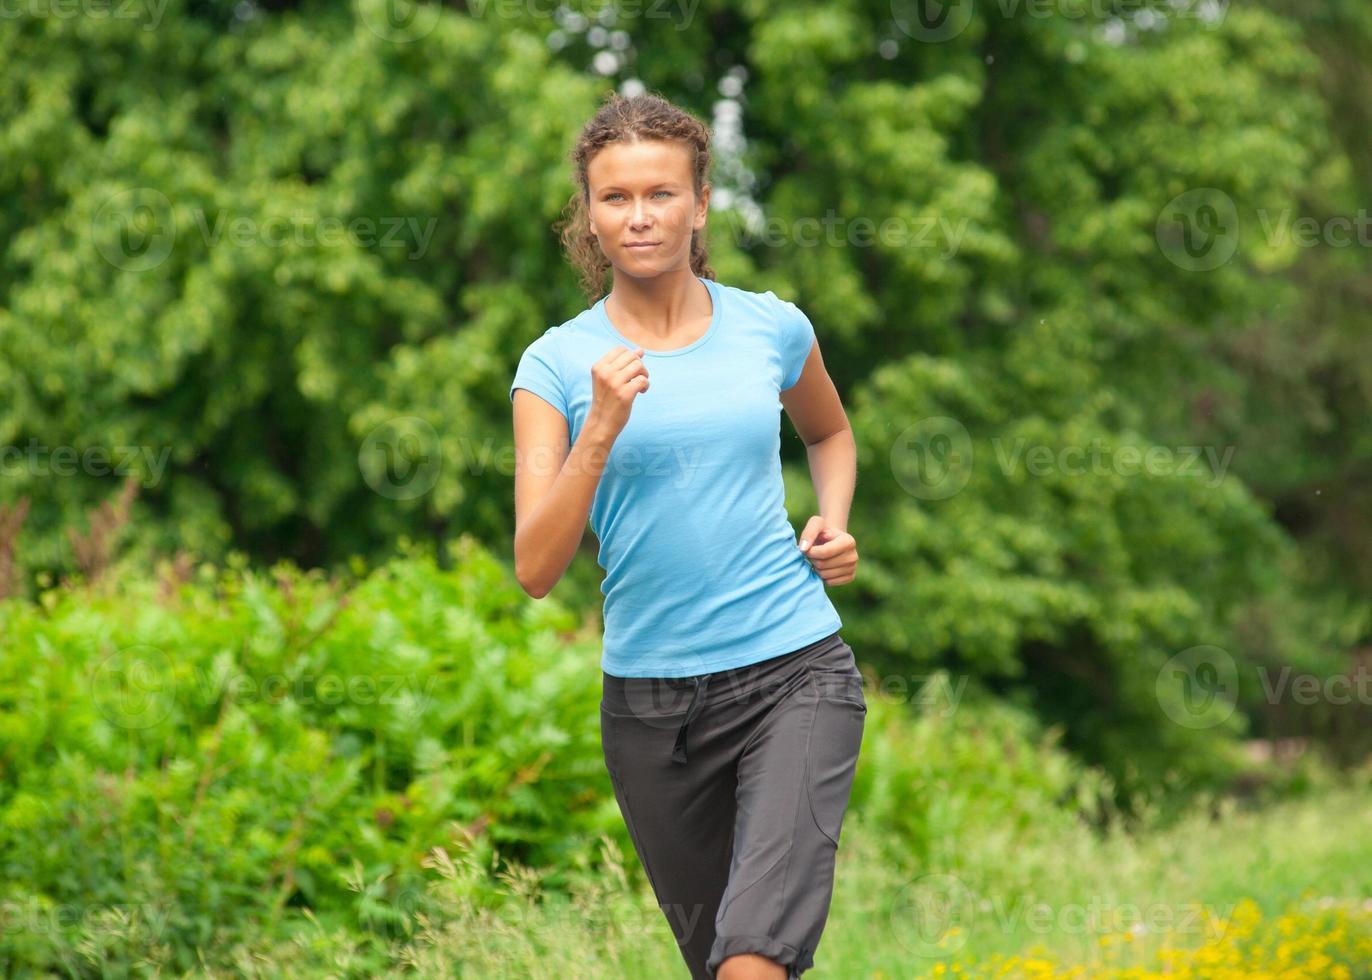 atleta, mujer, jogging, aire libre foto